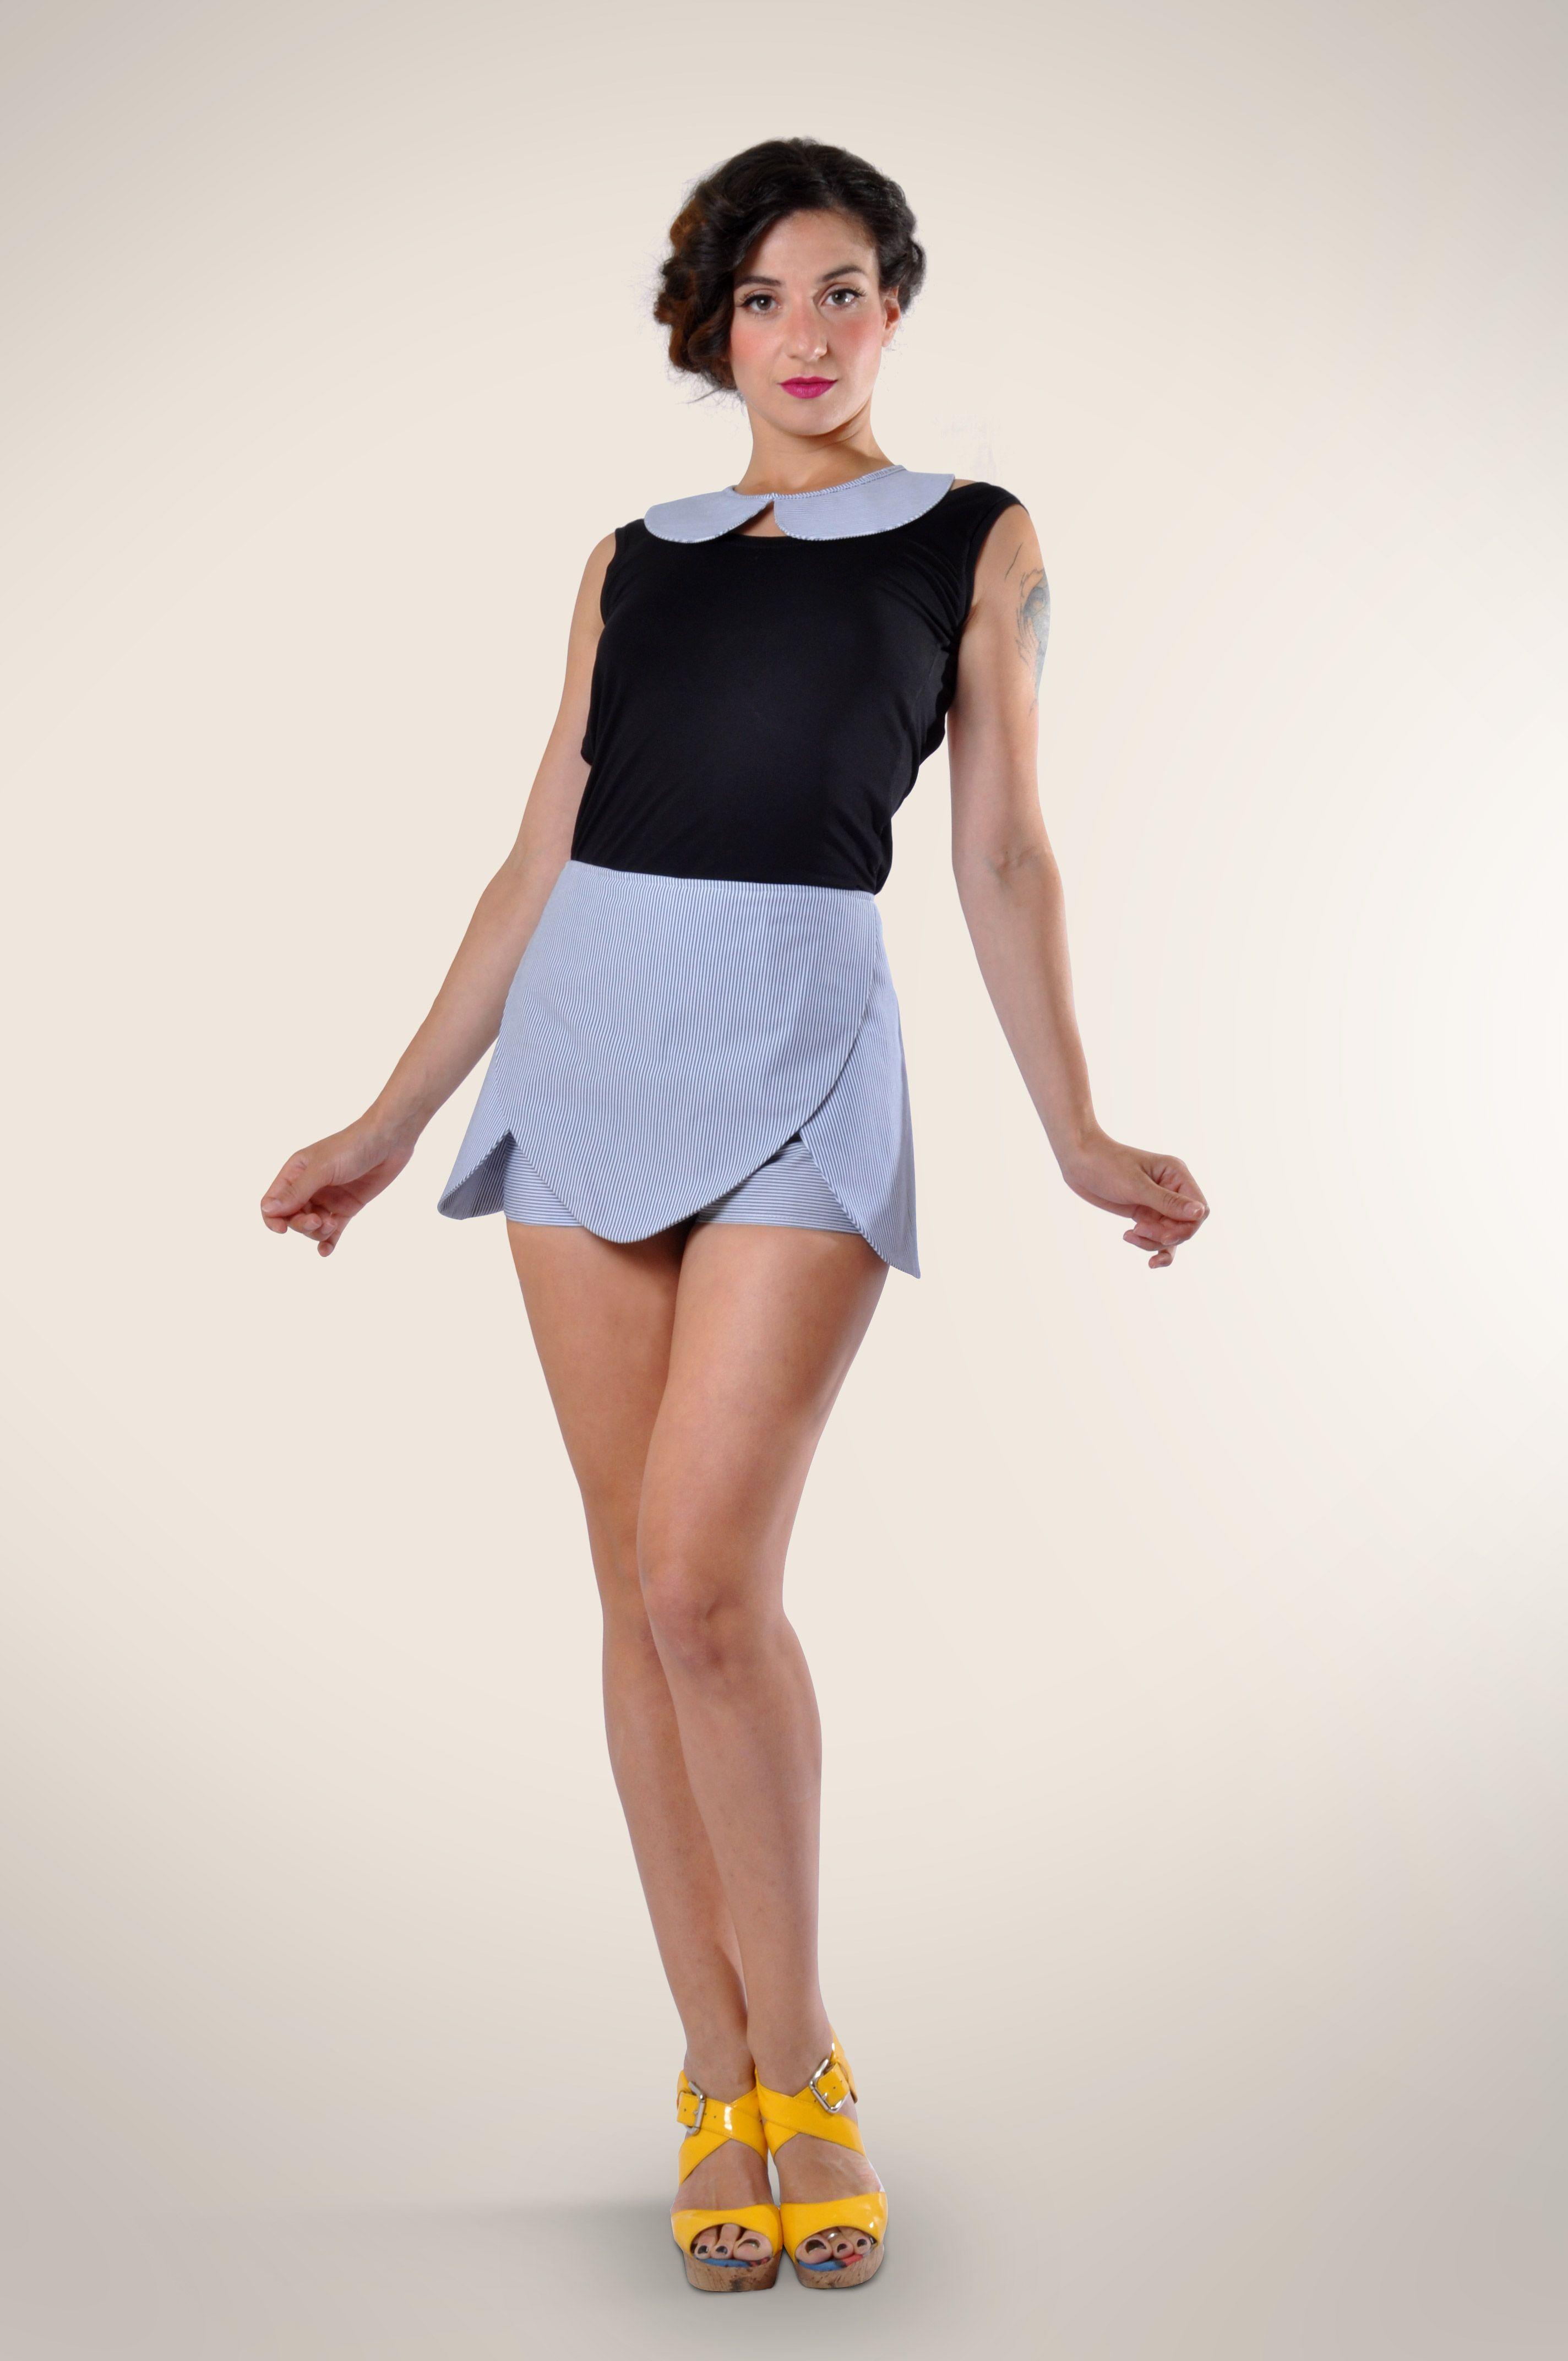 #lemoutonbleu #handmade #clothing #shorts #stipes #peterpan #stylish #summer #highwaist